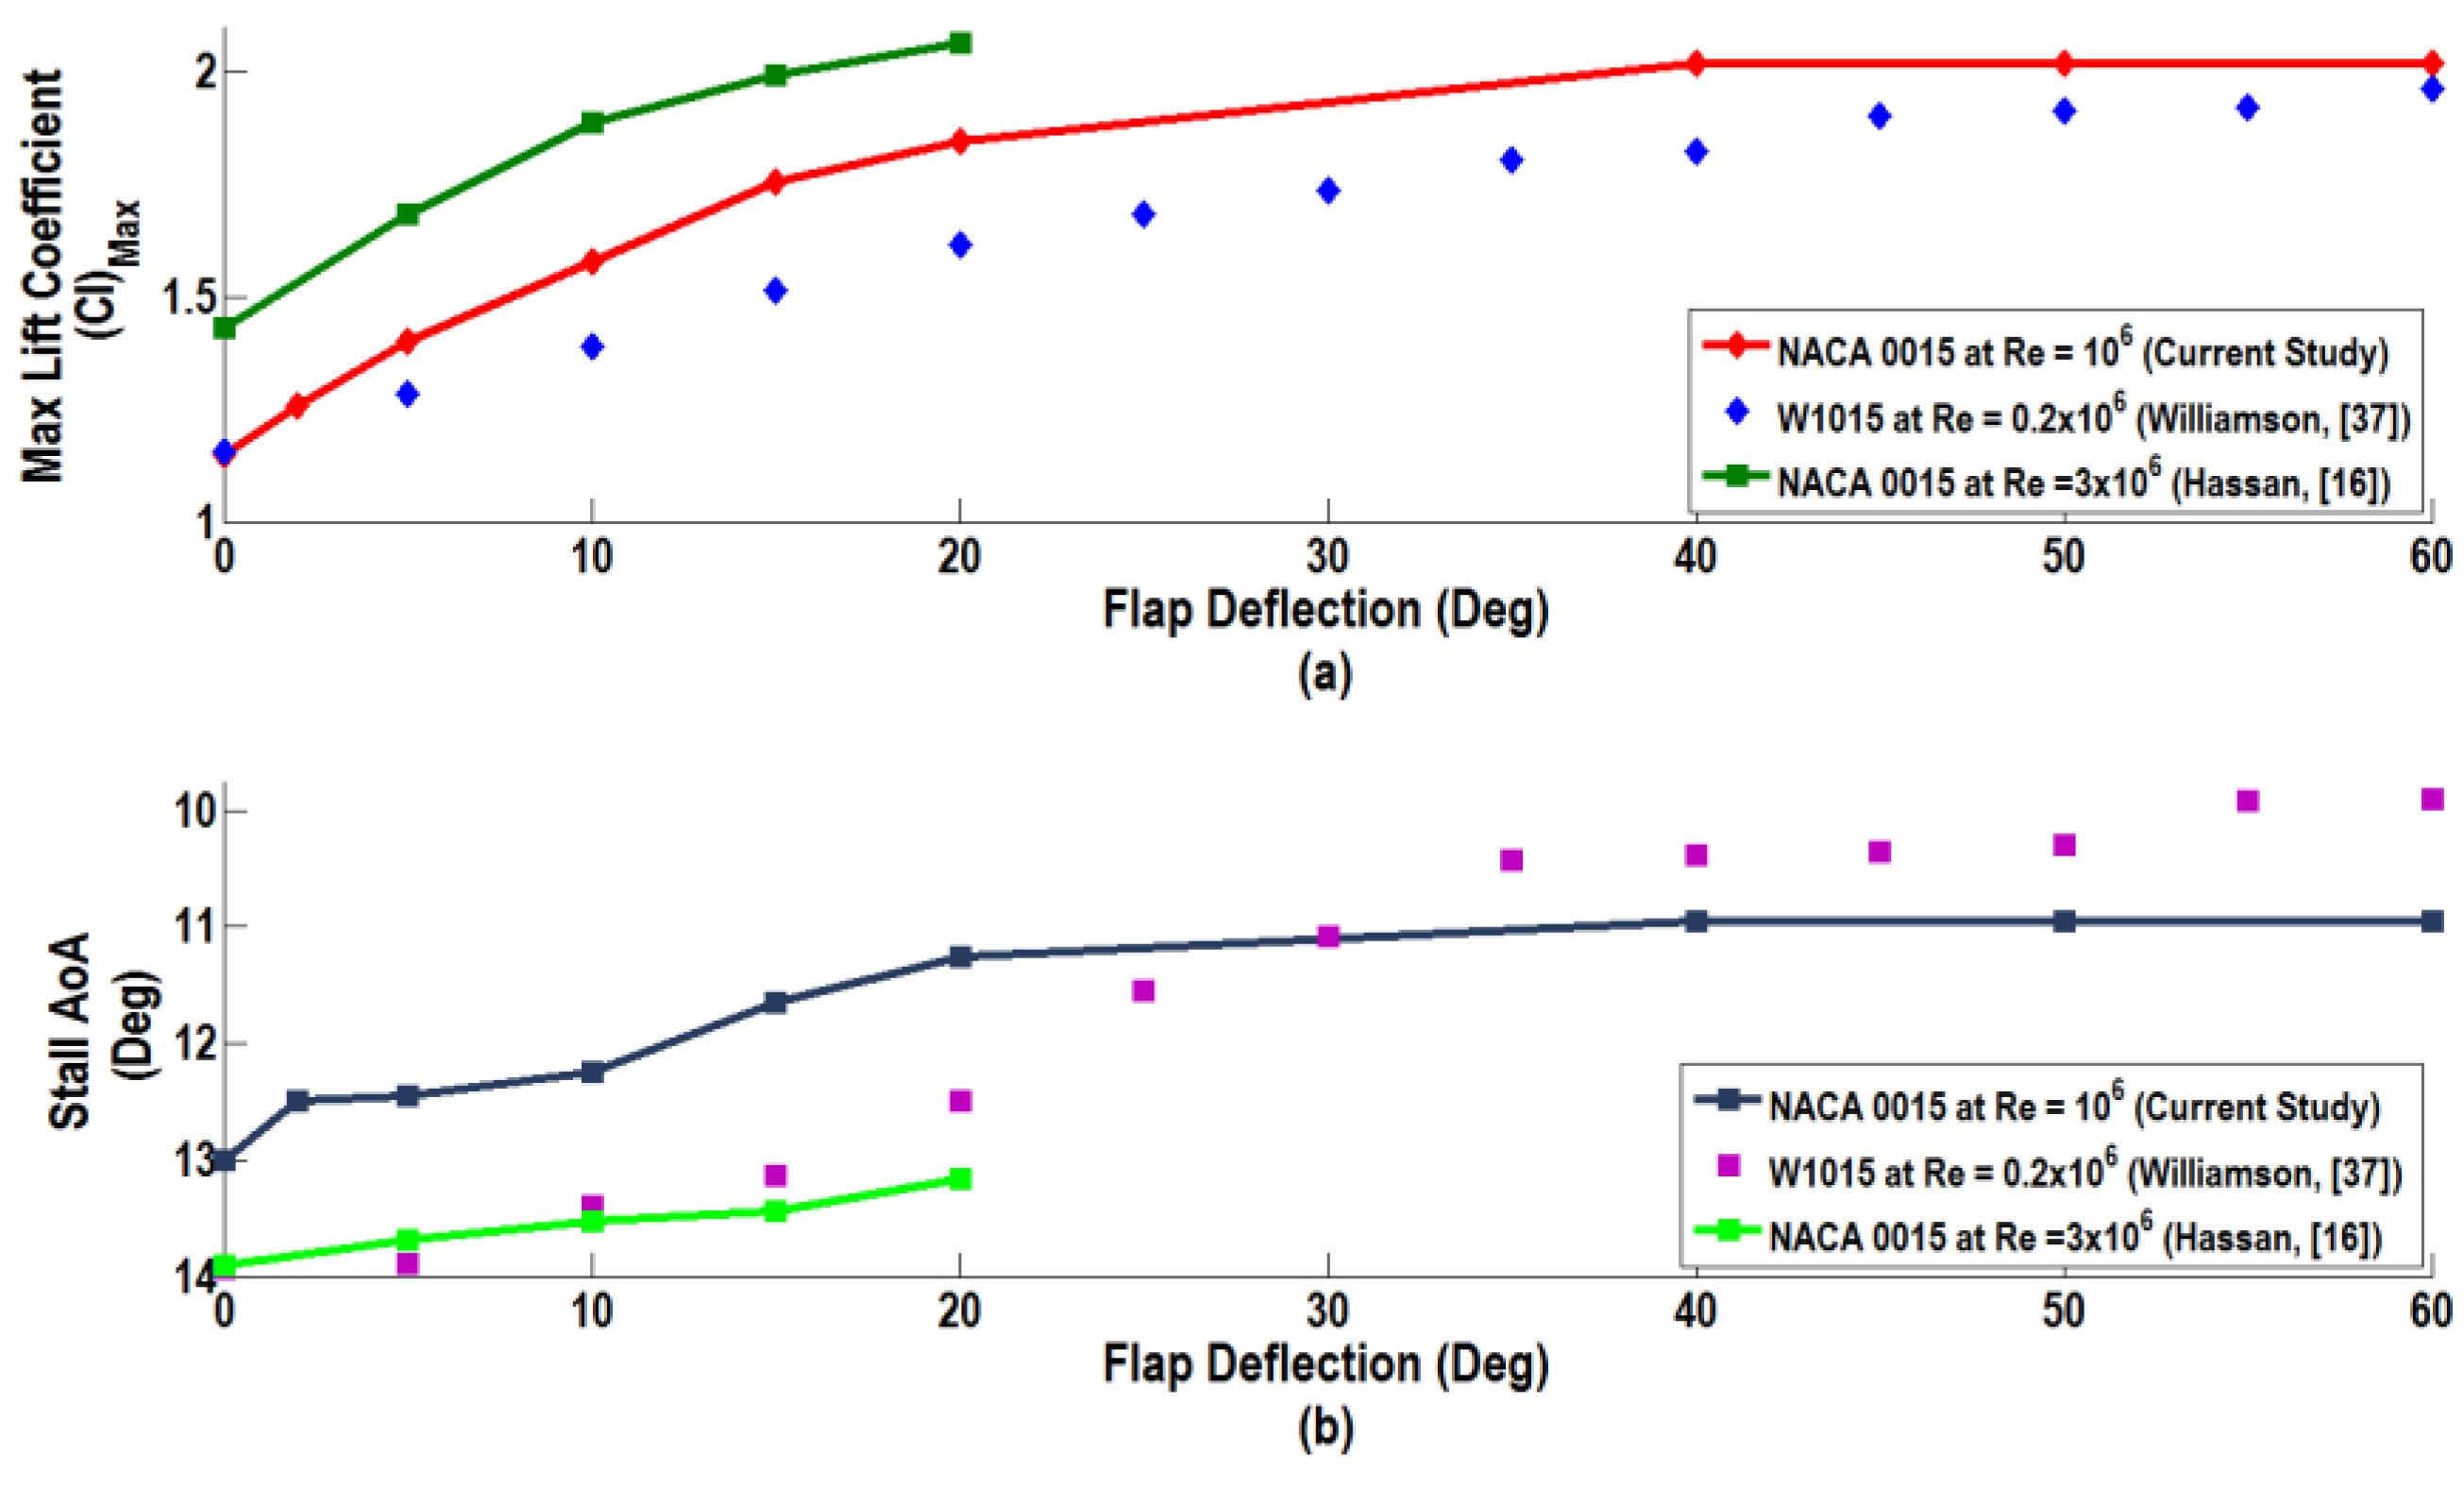 fluids  full text rans simulations  aerodynamic performance  naca  flapped airfoil